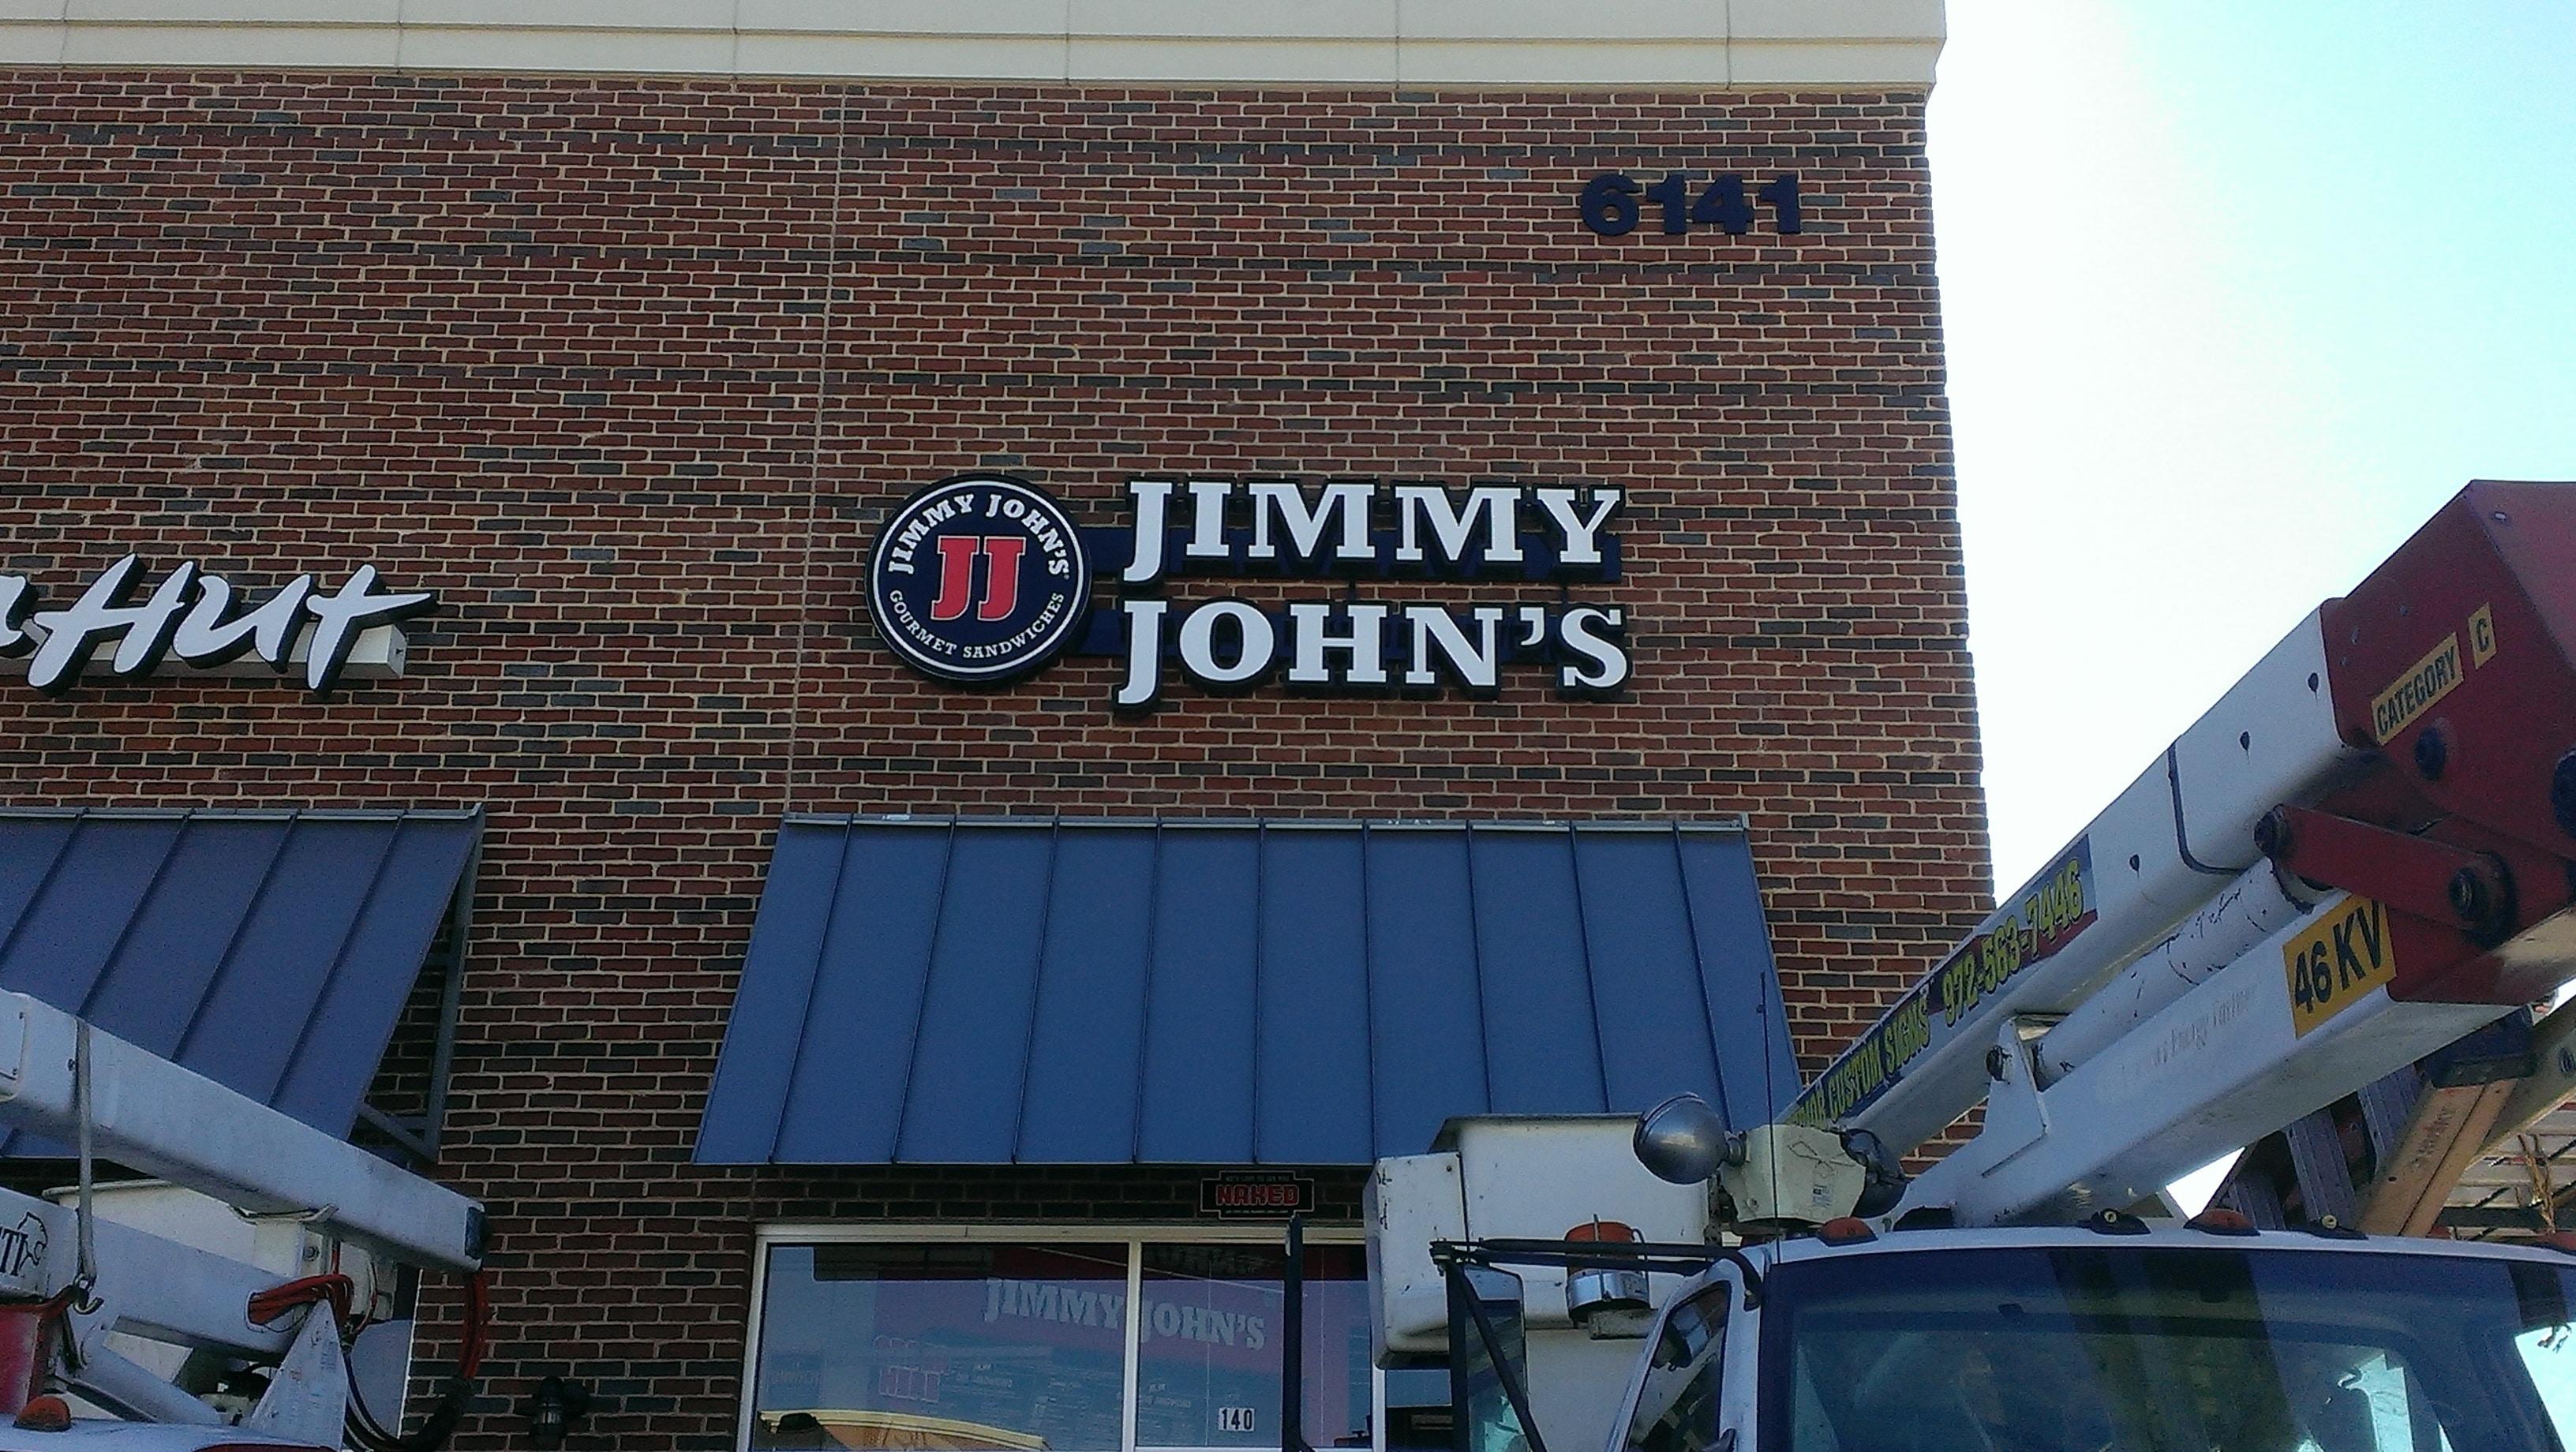 Storefront sign for Jimmy John